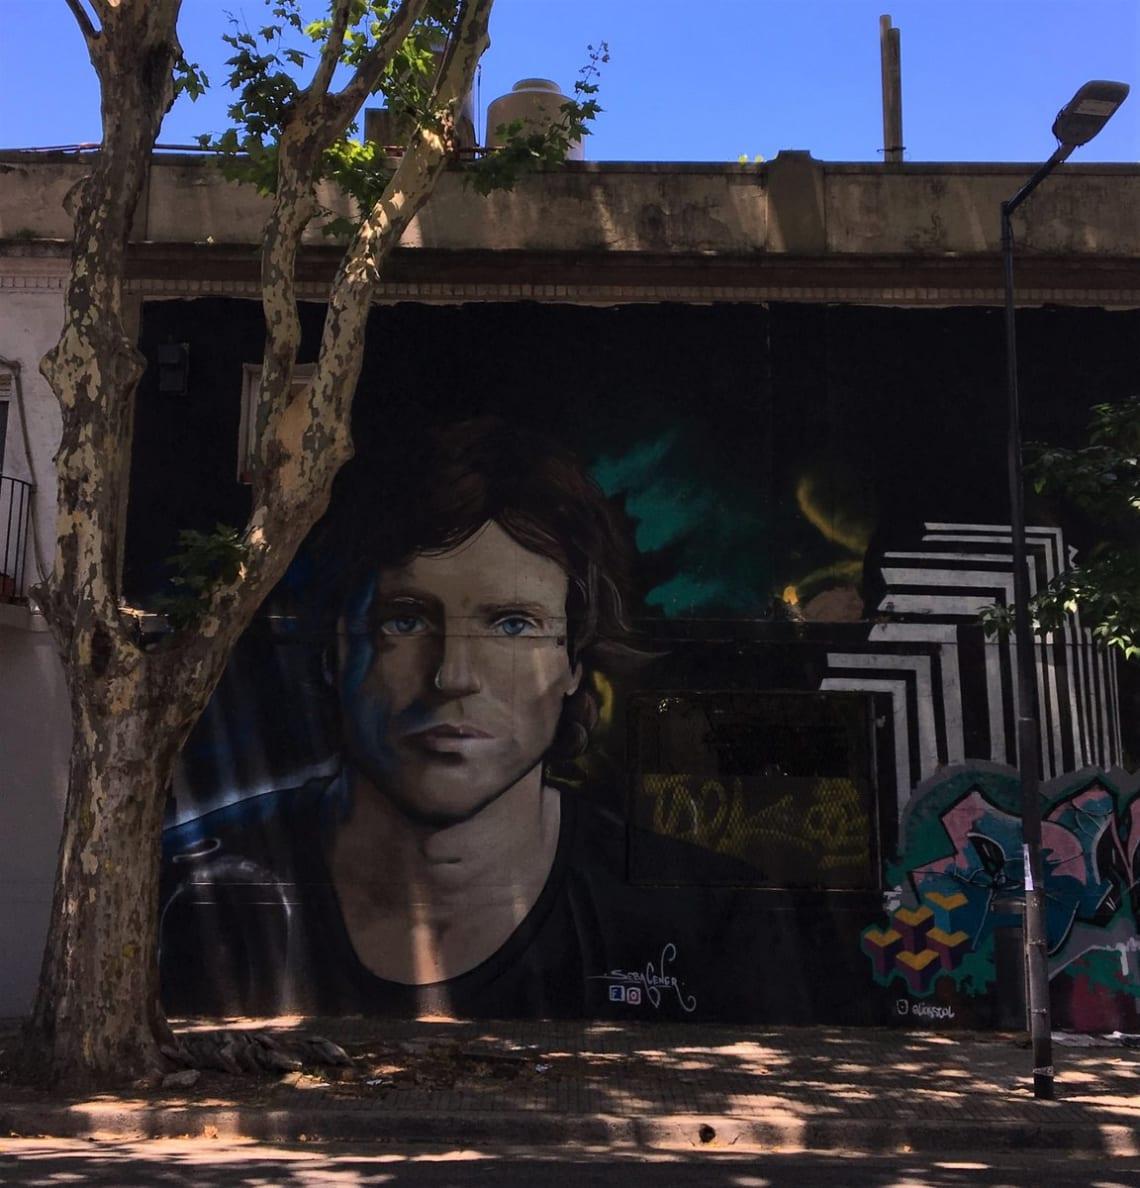 Mega guía para viajar a Buenos Aires: todo lo que debes que saber - Worldpackers - grafiti en calle de palermo